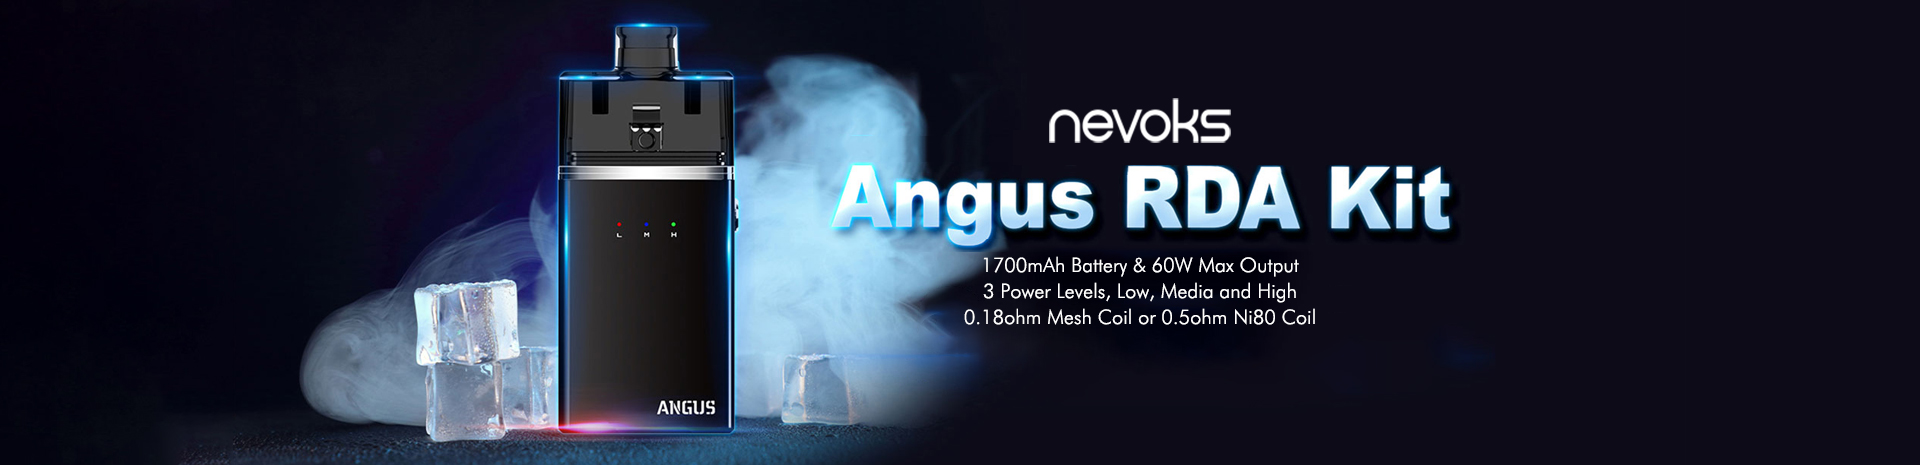 Nevoks Angus RDA Kit Banner